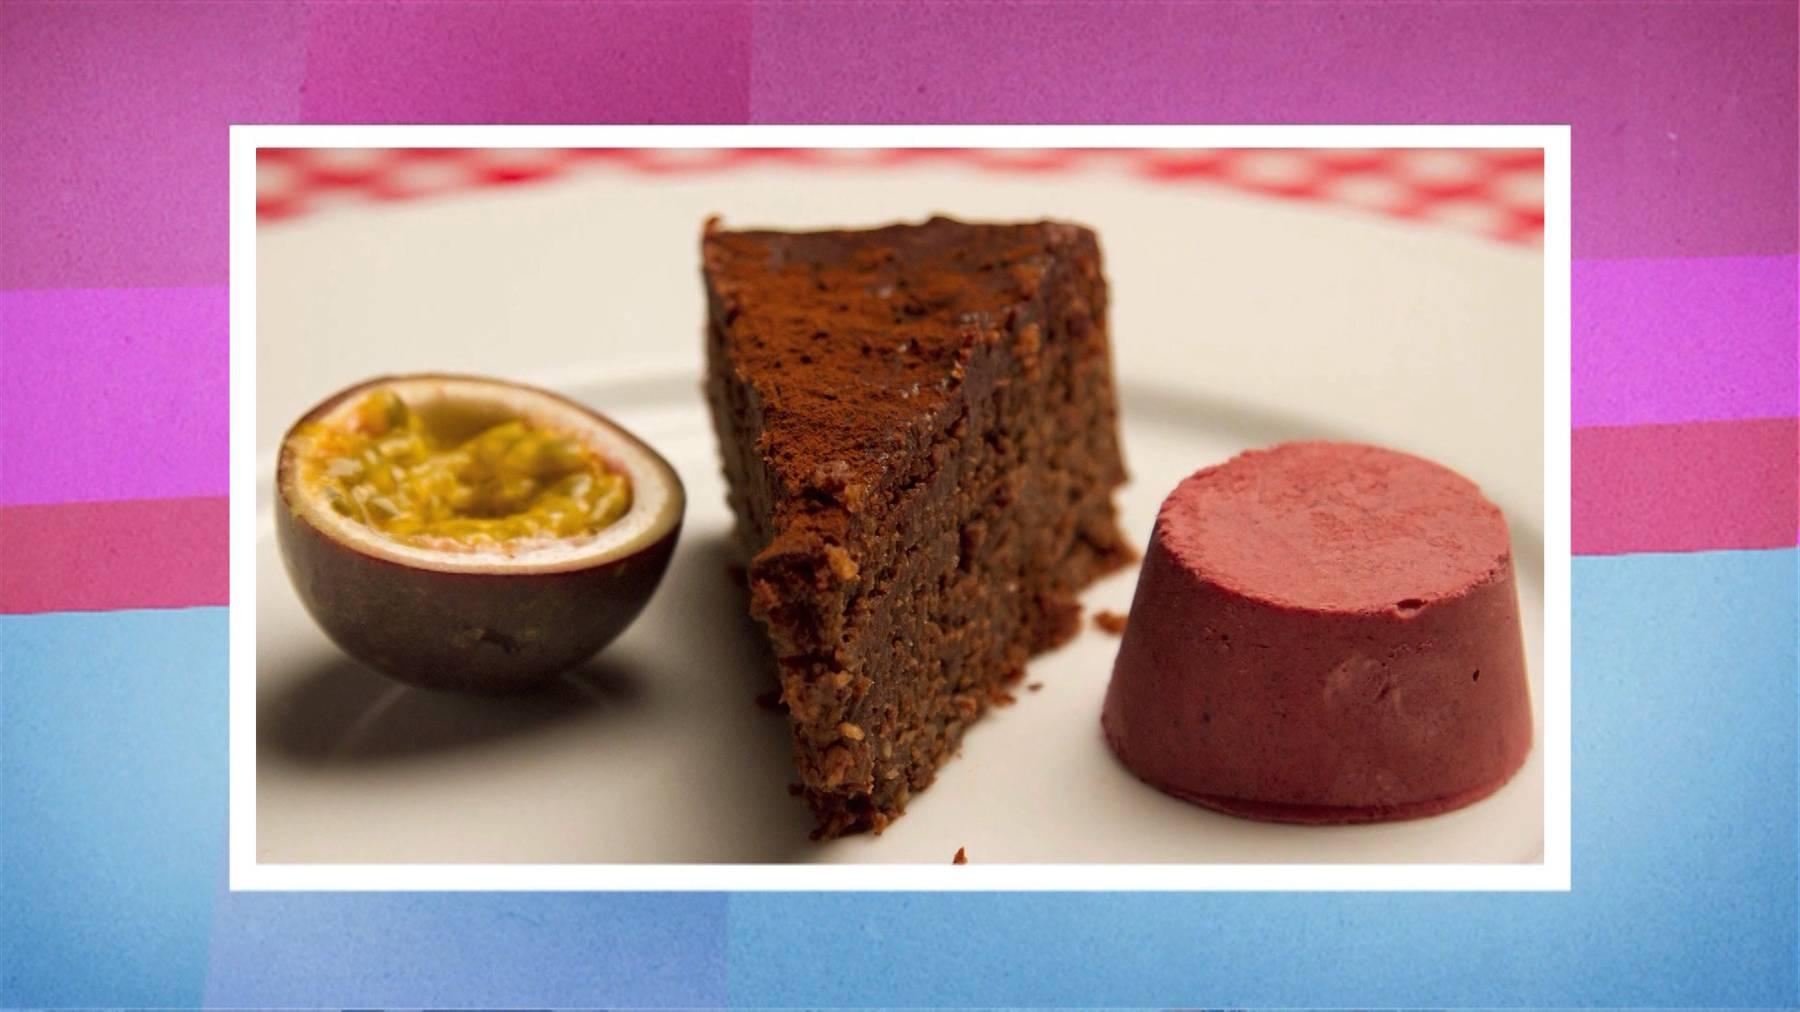 Gateau Chocolat-Fruit de la passion, Semifreddo der roten Beere